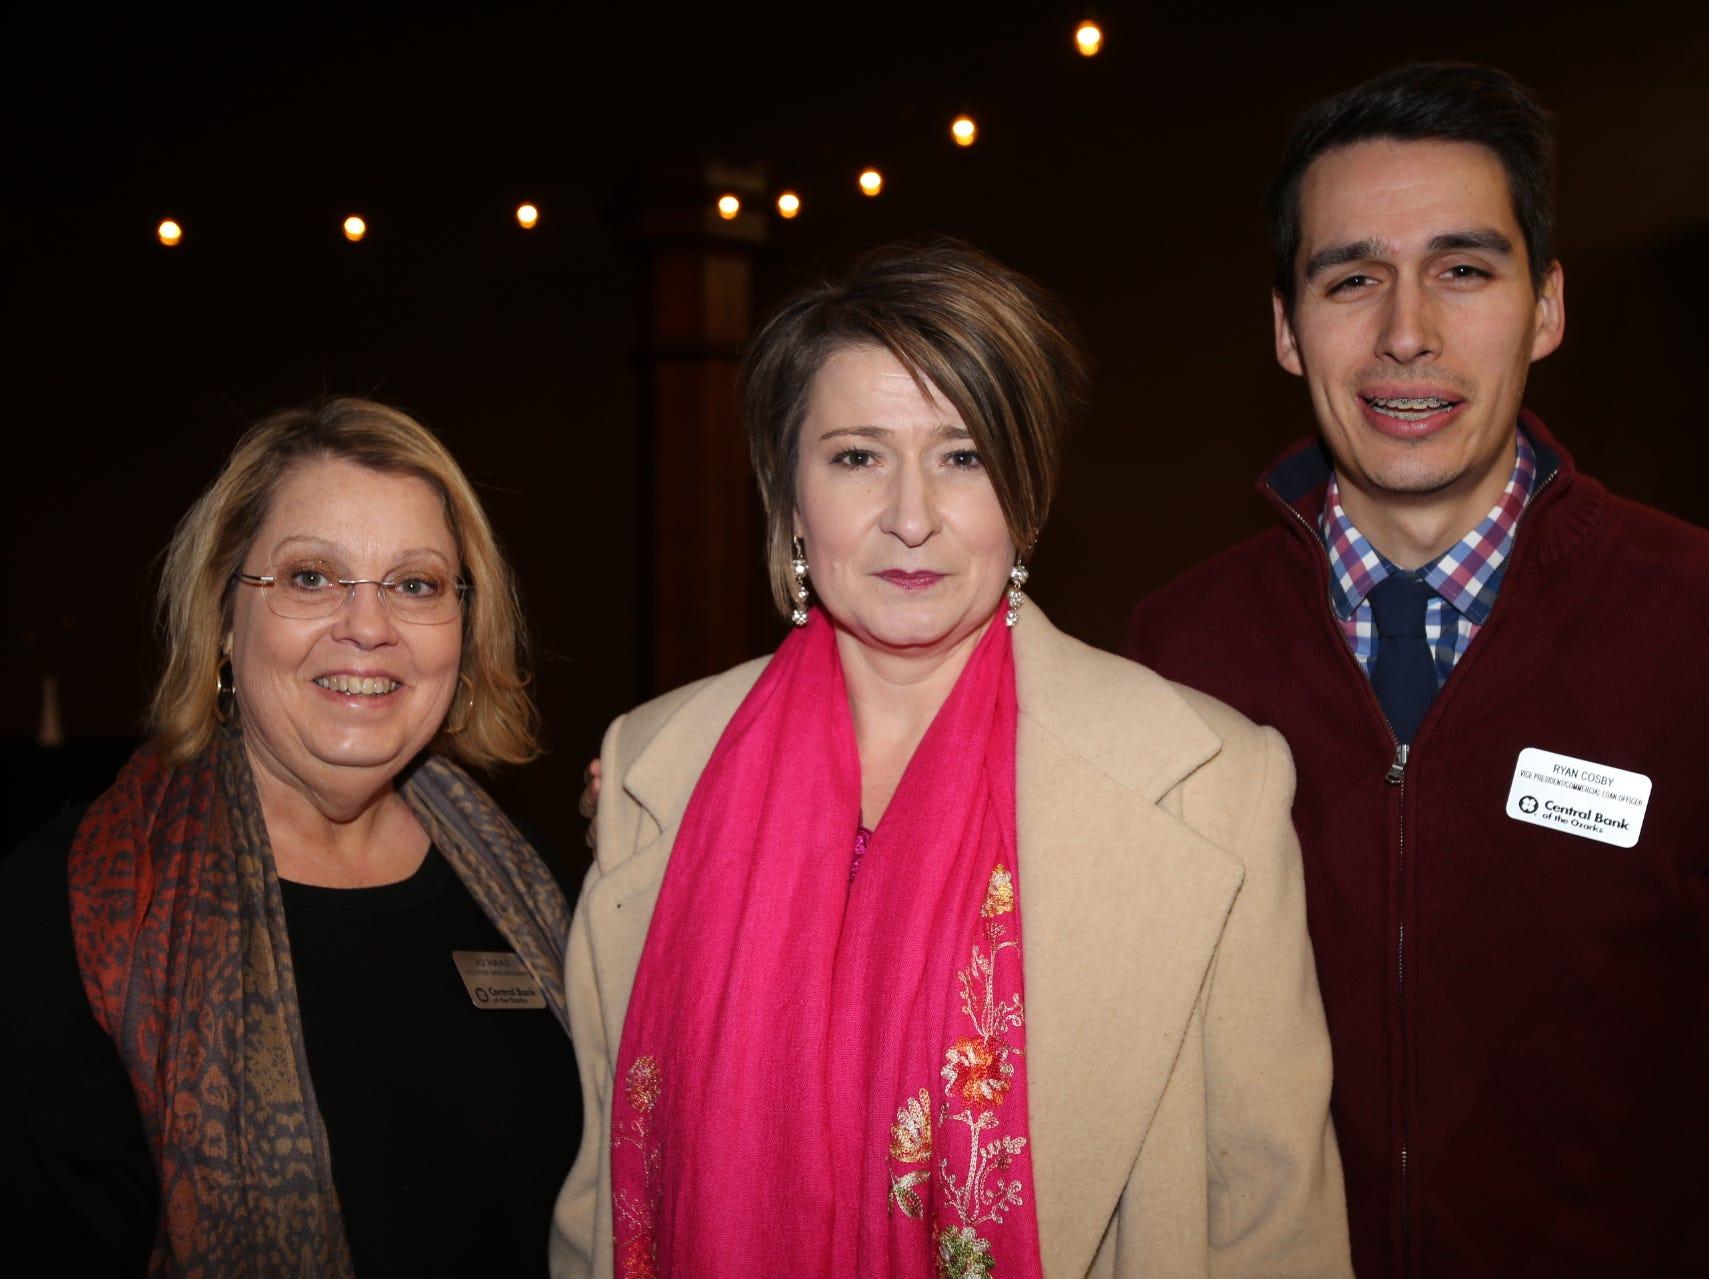 Jo Haas, Kara Turner, and Ryan Cosby